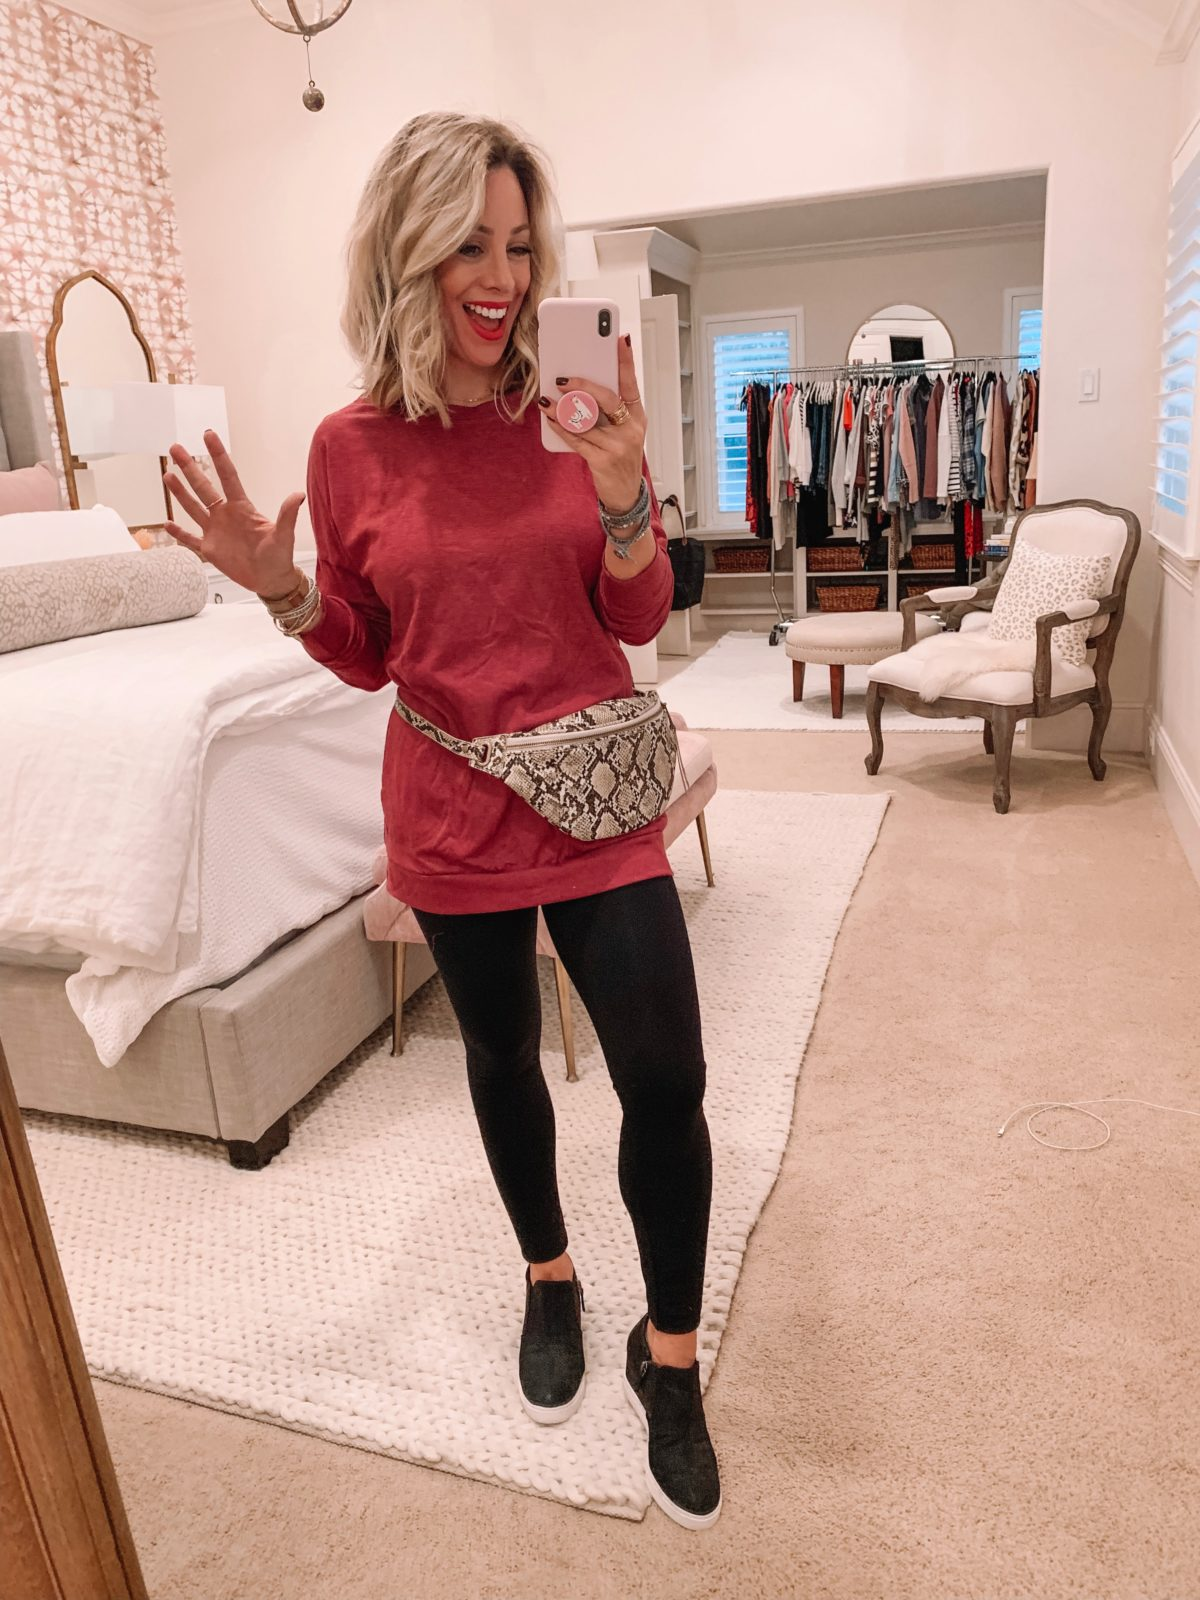 Amazon fashion haul, long sleeve top and leggings